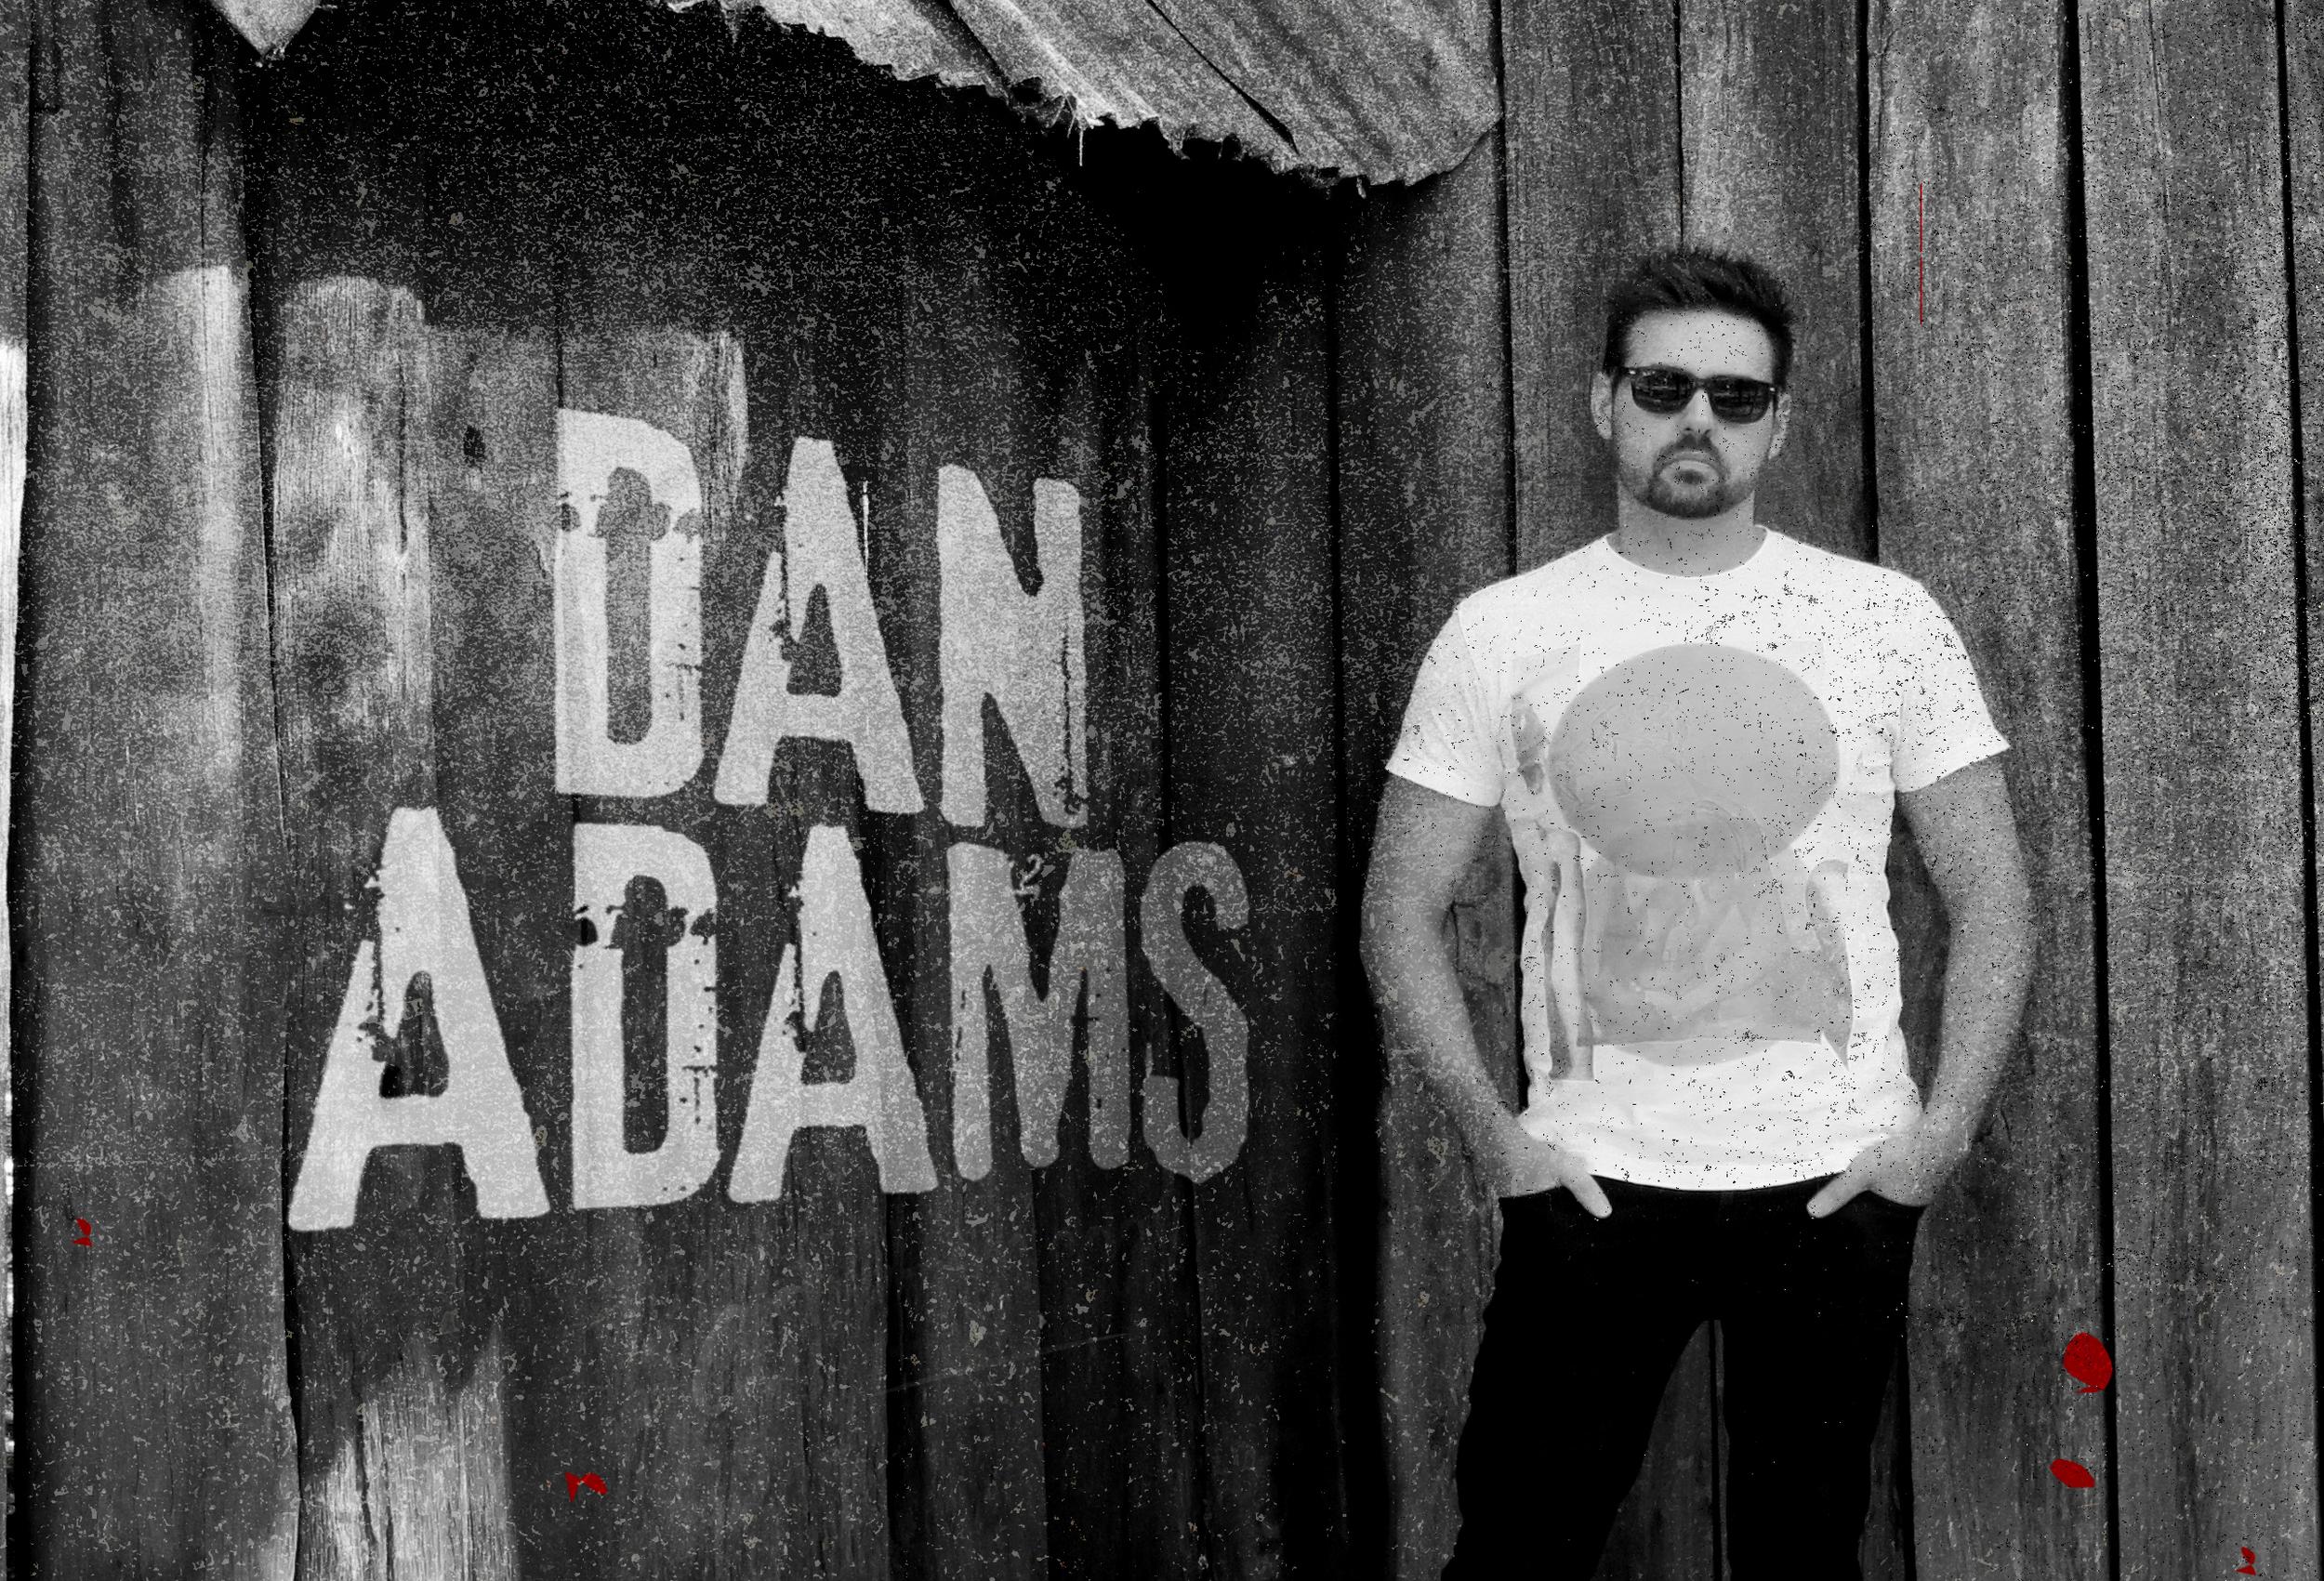 DanAdams_croppedshot.jpg